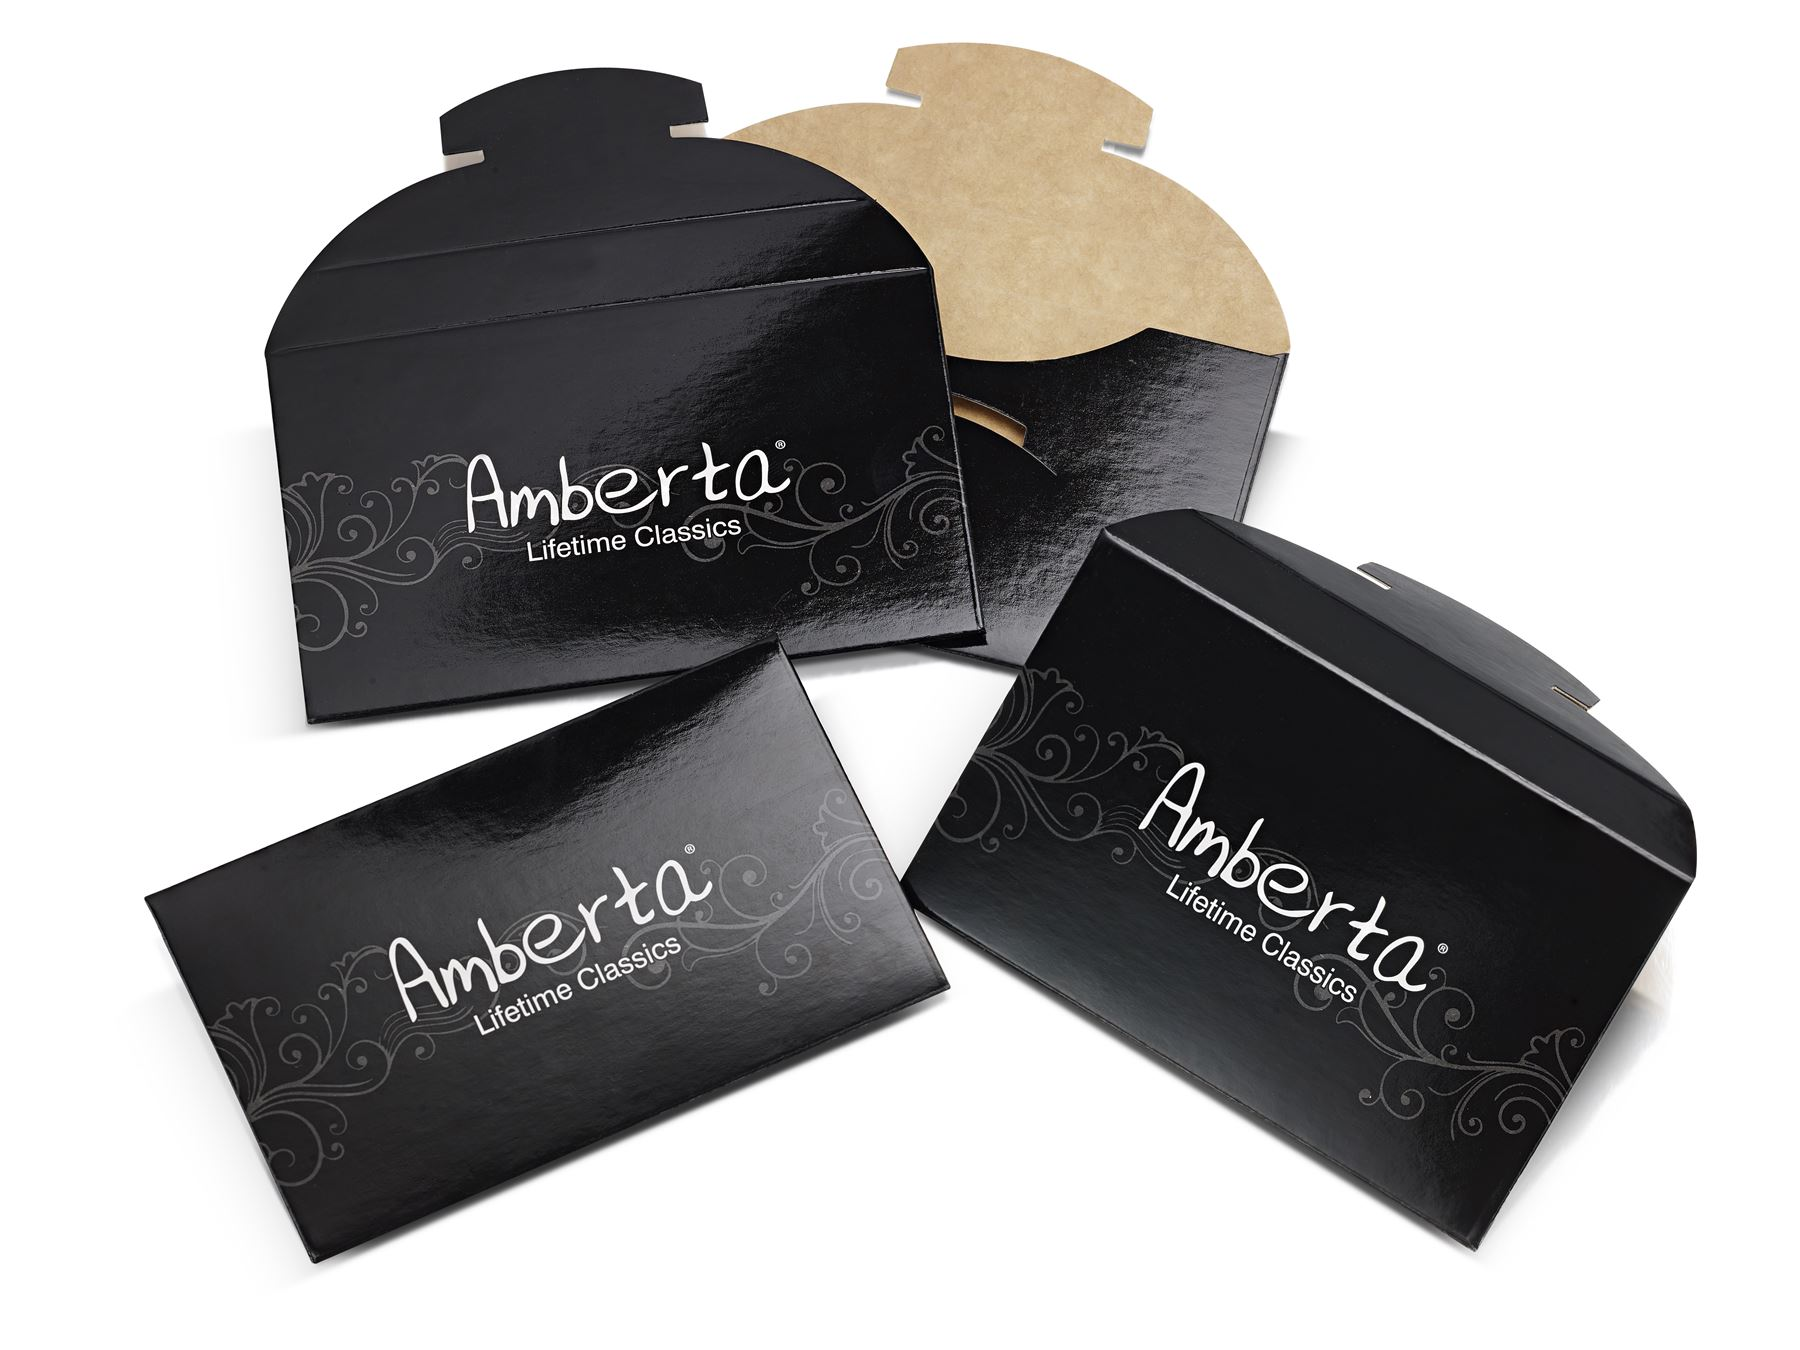 Amberta-Jewelry-925-Sterling-Silver-Adjustable-Bracelet-Italian-Bangle-for-Women miniature 25